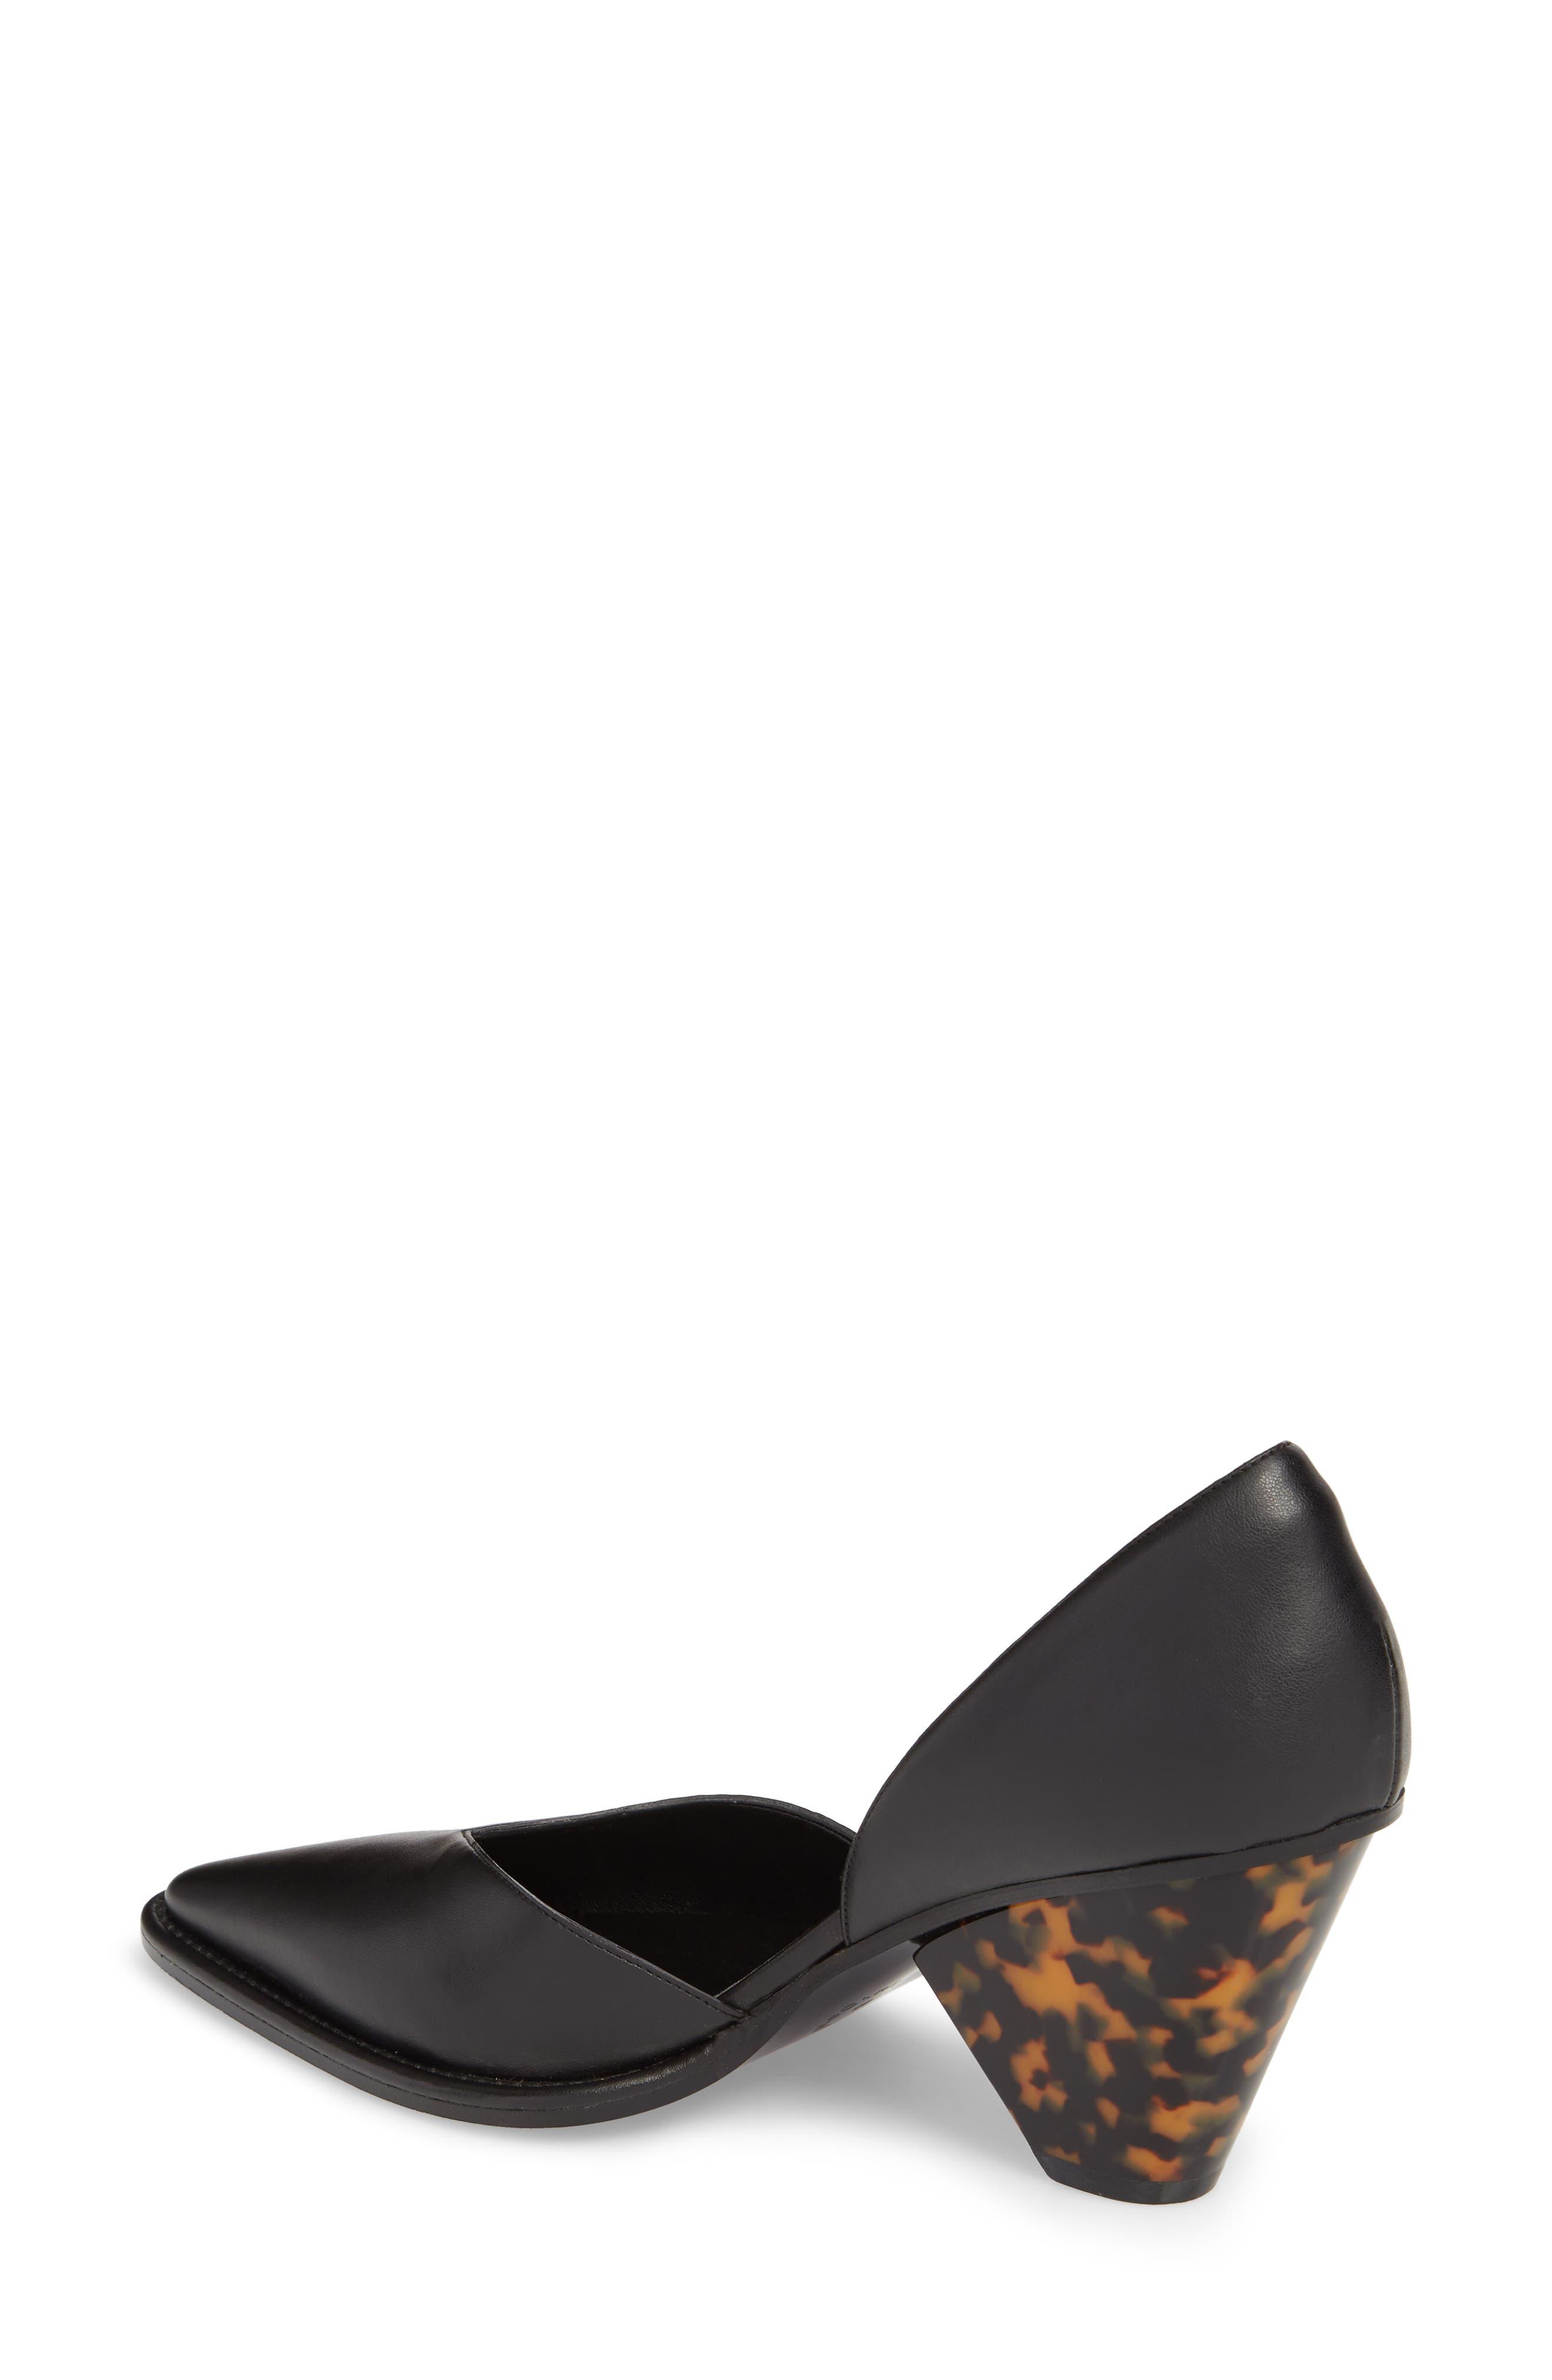 Tortoiseshell Heel d'Orsay Pump,                             Alternate thumbnail 2, color,                             Black